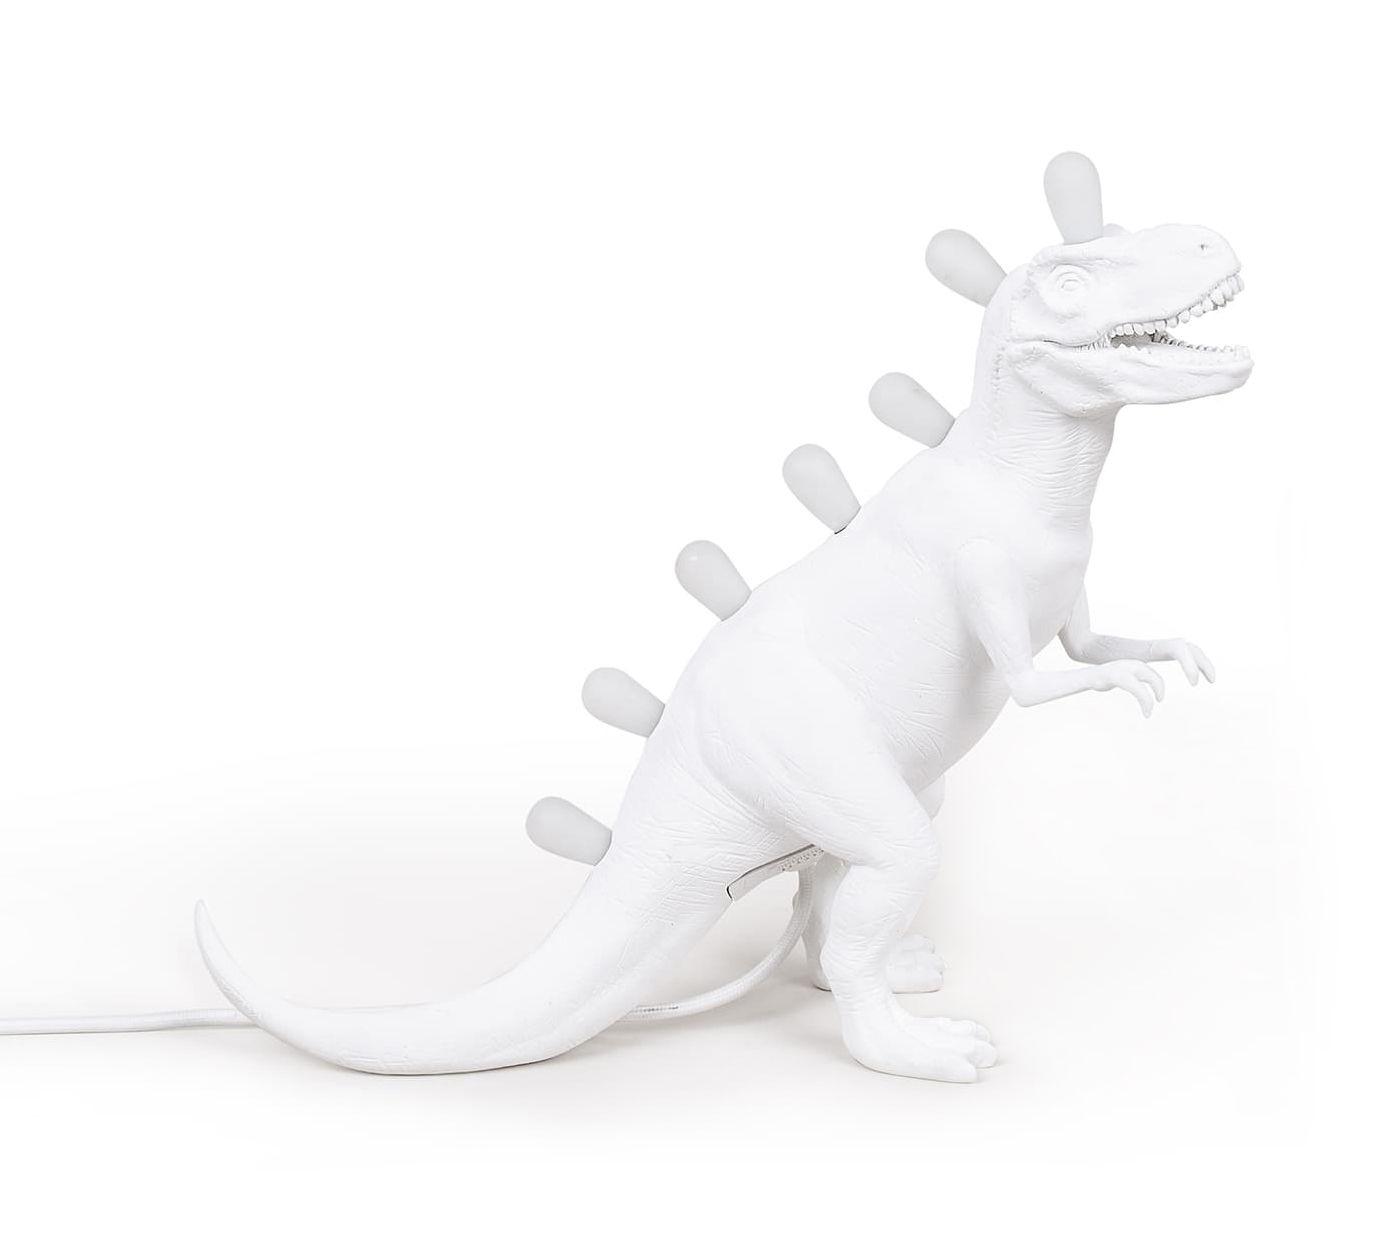 Decoration - Children's Home Accessories - Jurassic Table lamp - / Tyrannosaurus by Seletti - Tyrannosaurus / White - Resin